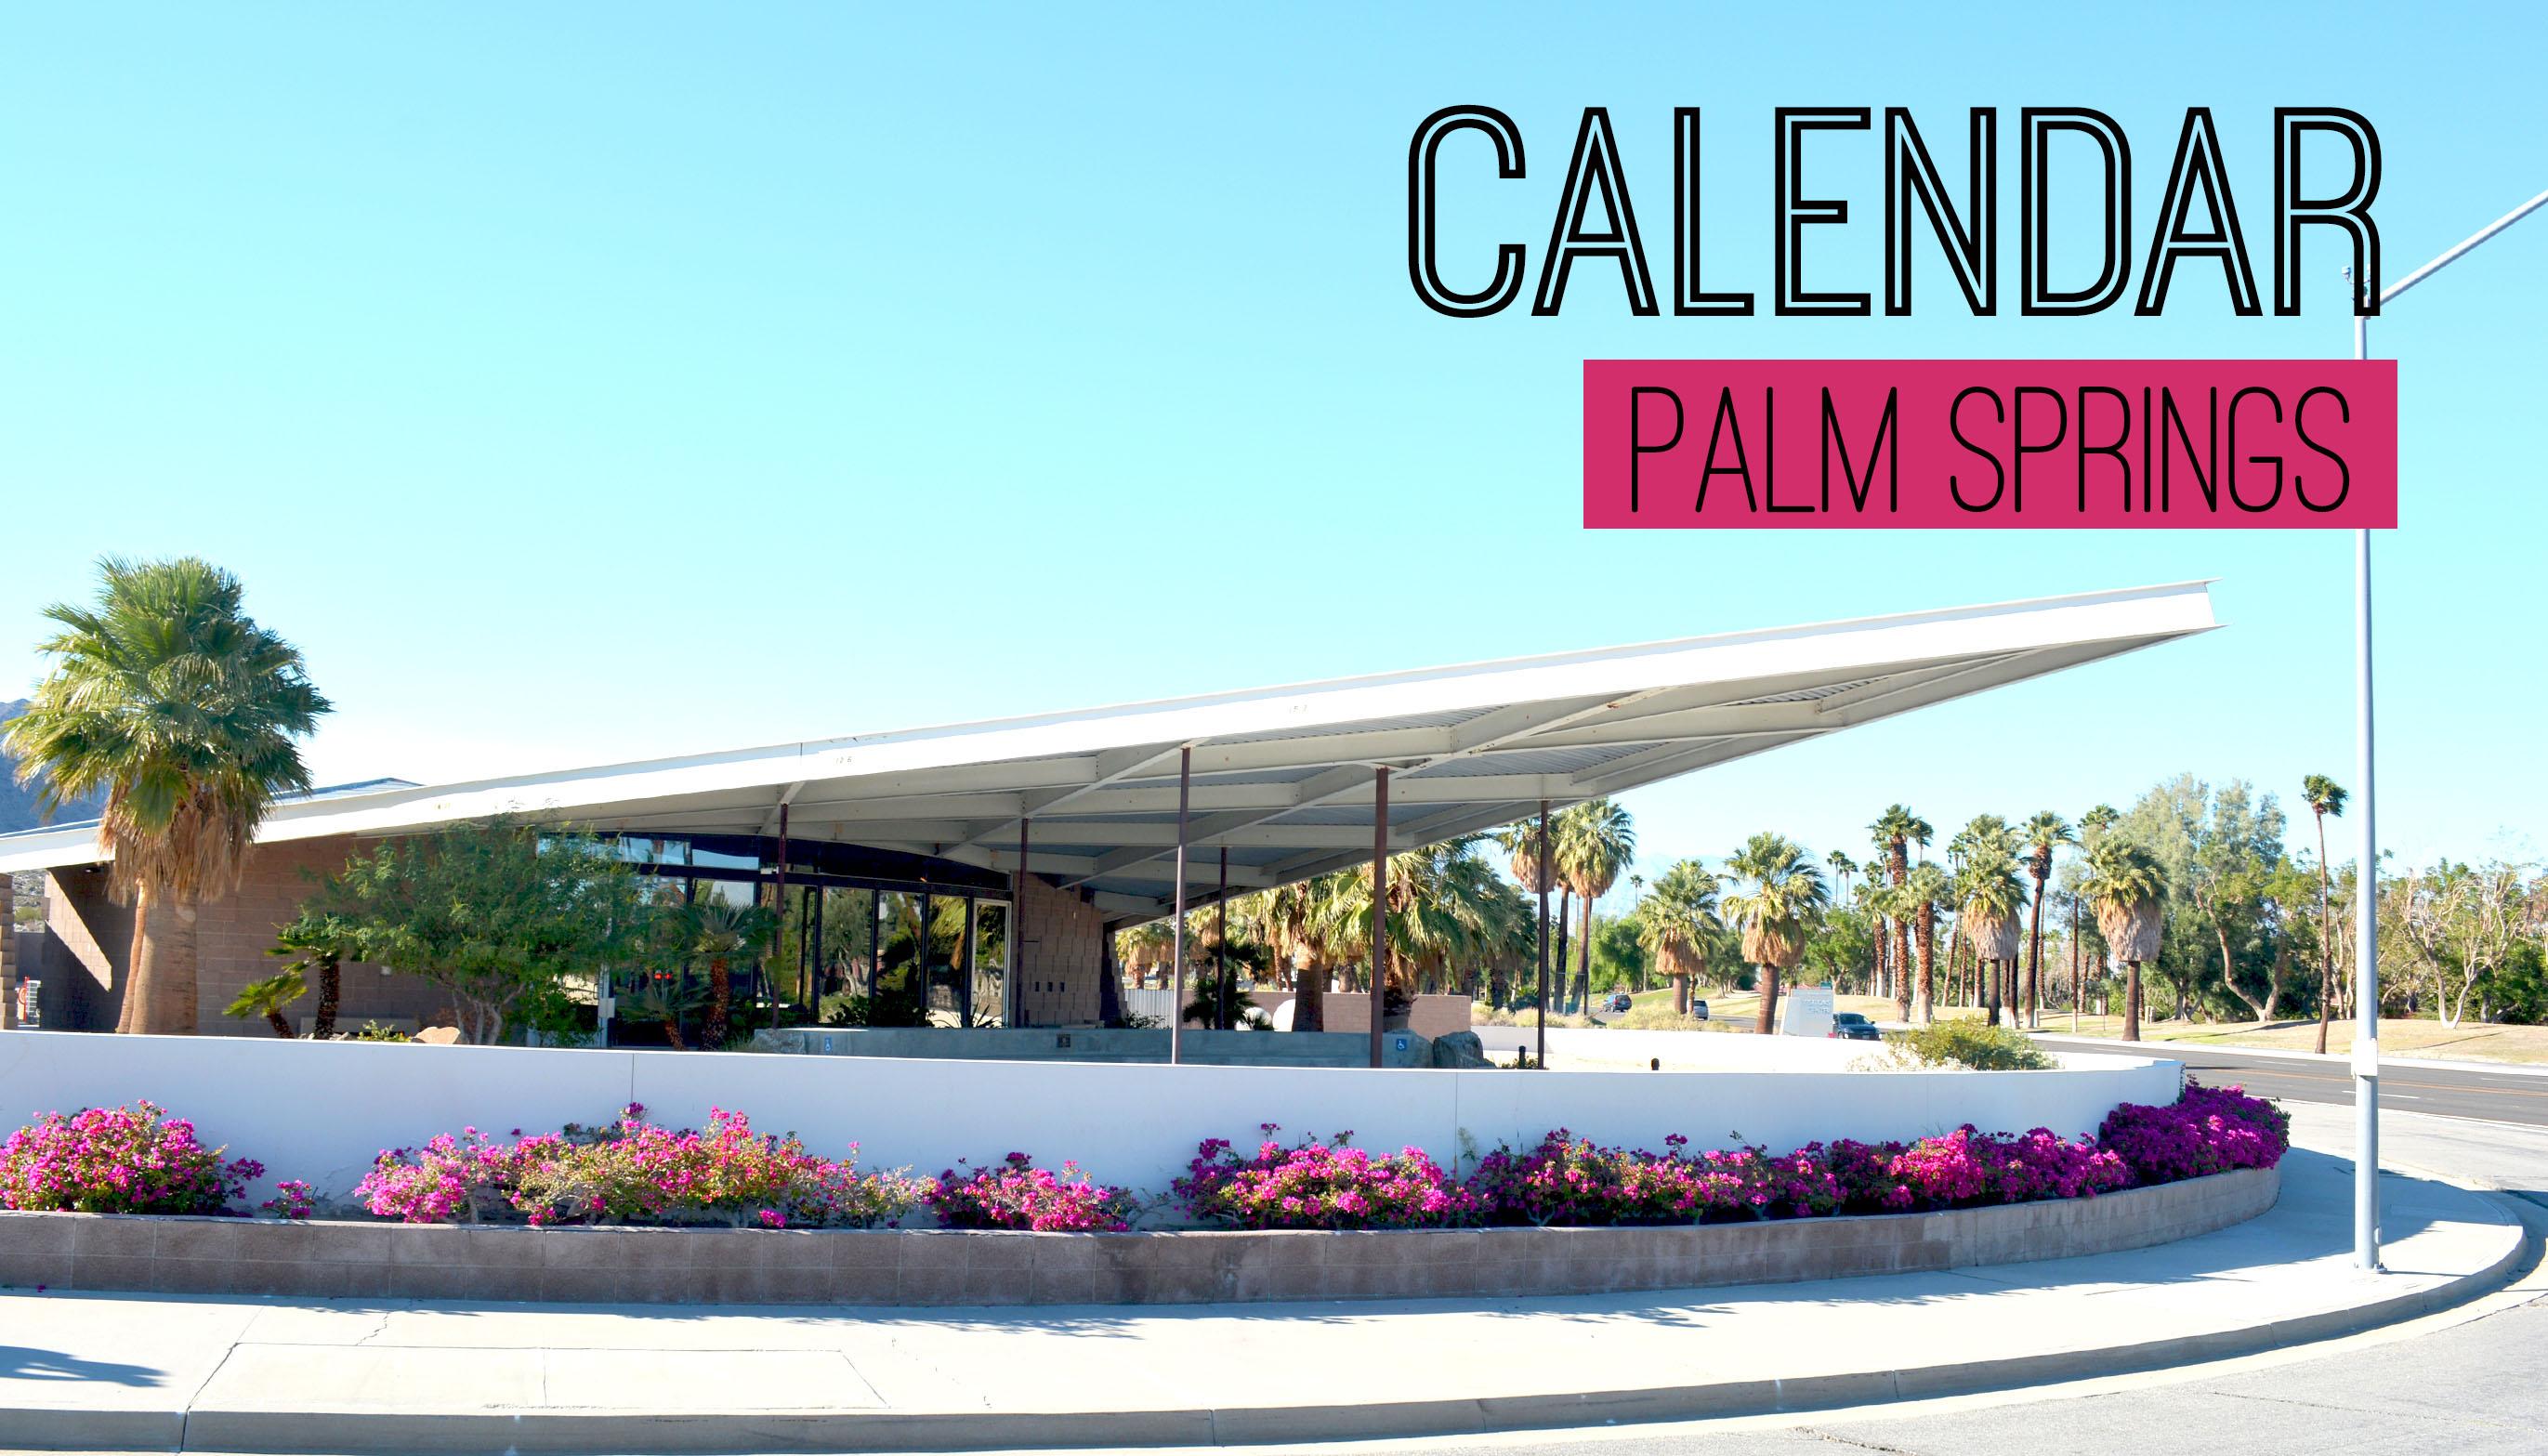 calendarPS!